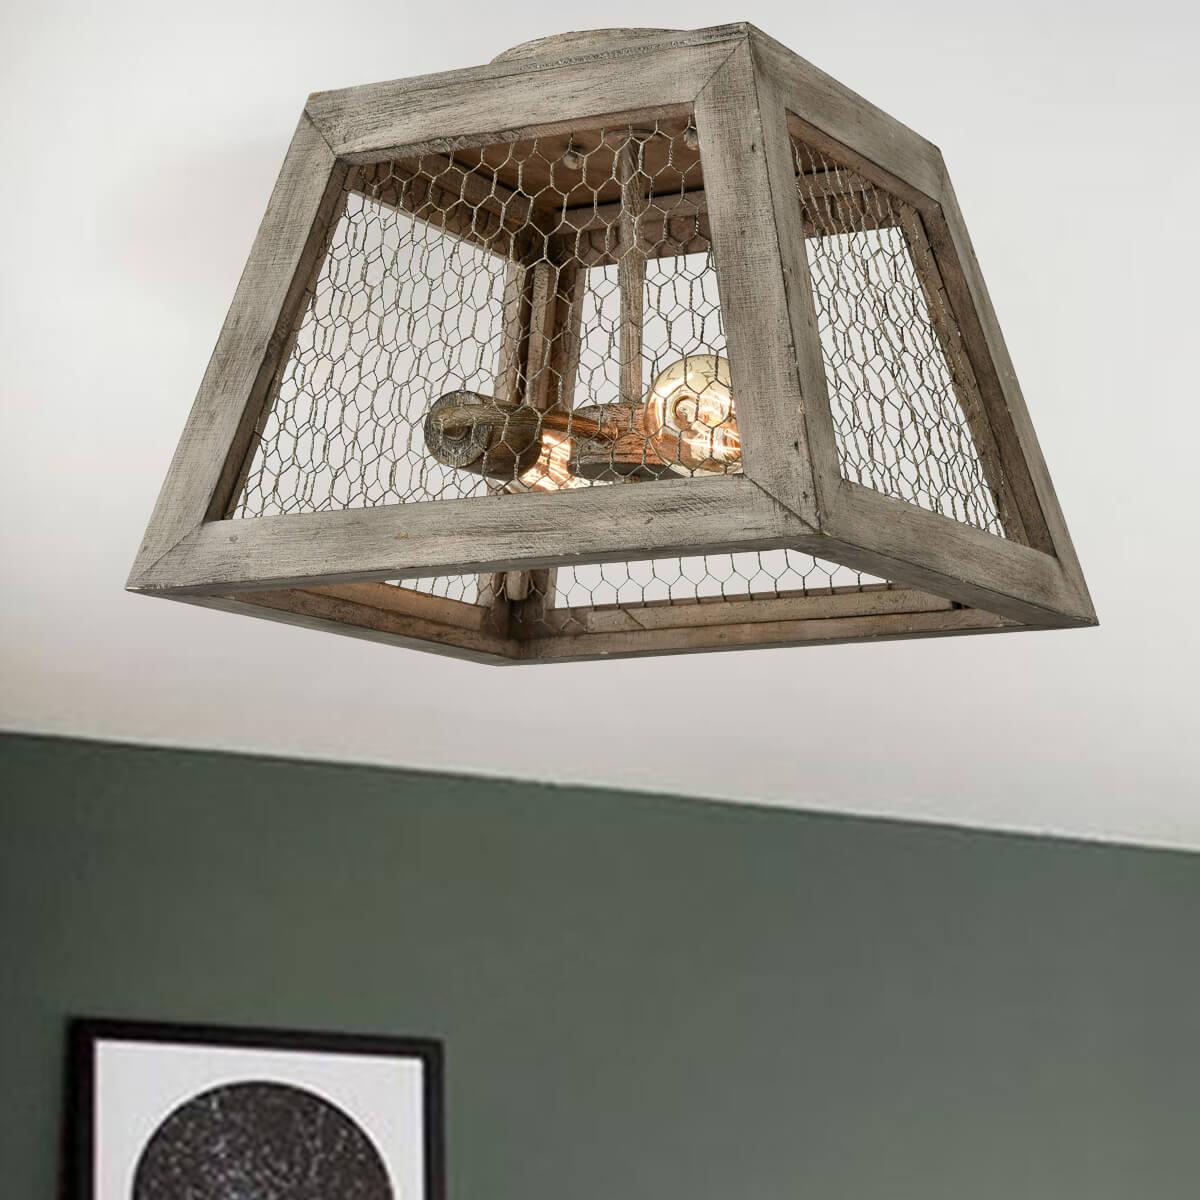 Rustic Distressed Wood Ceiling Light Fixture Flush Mount